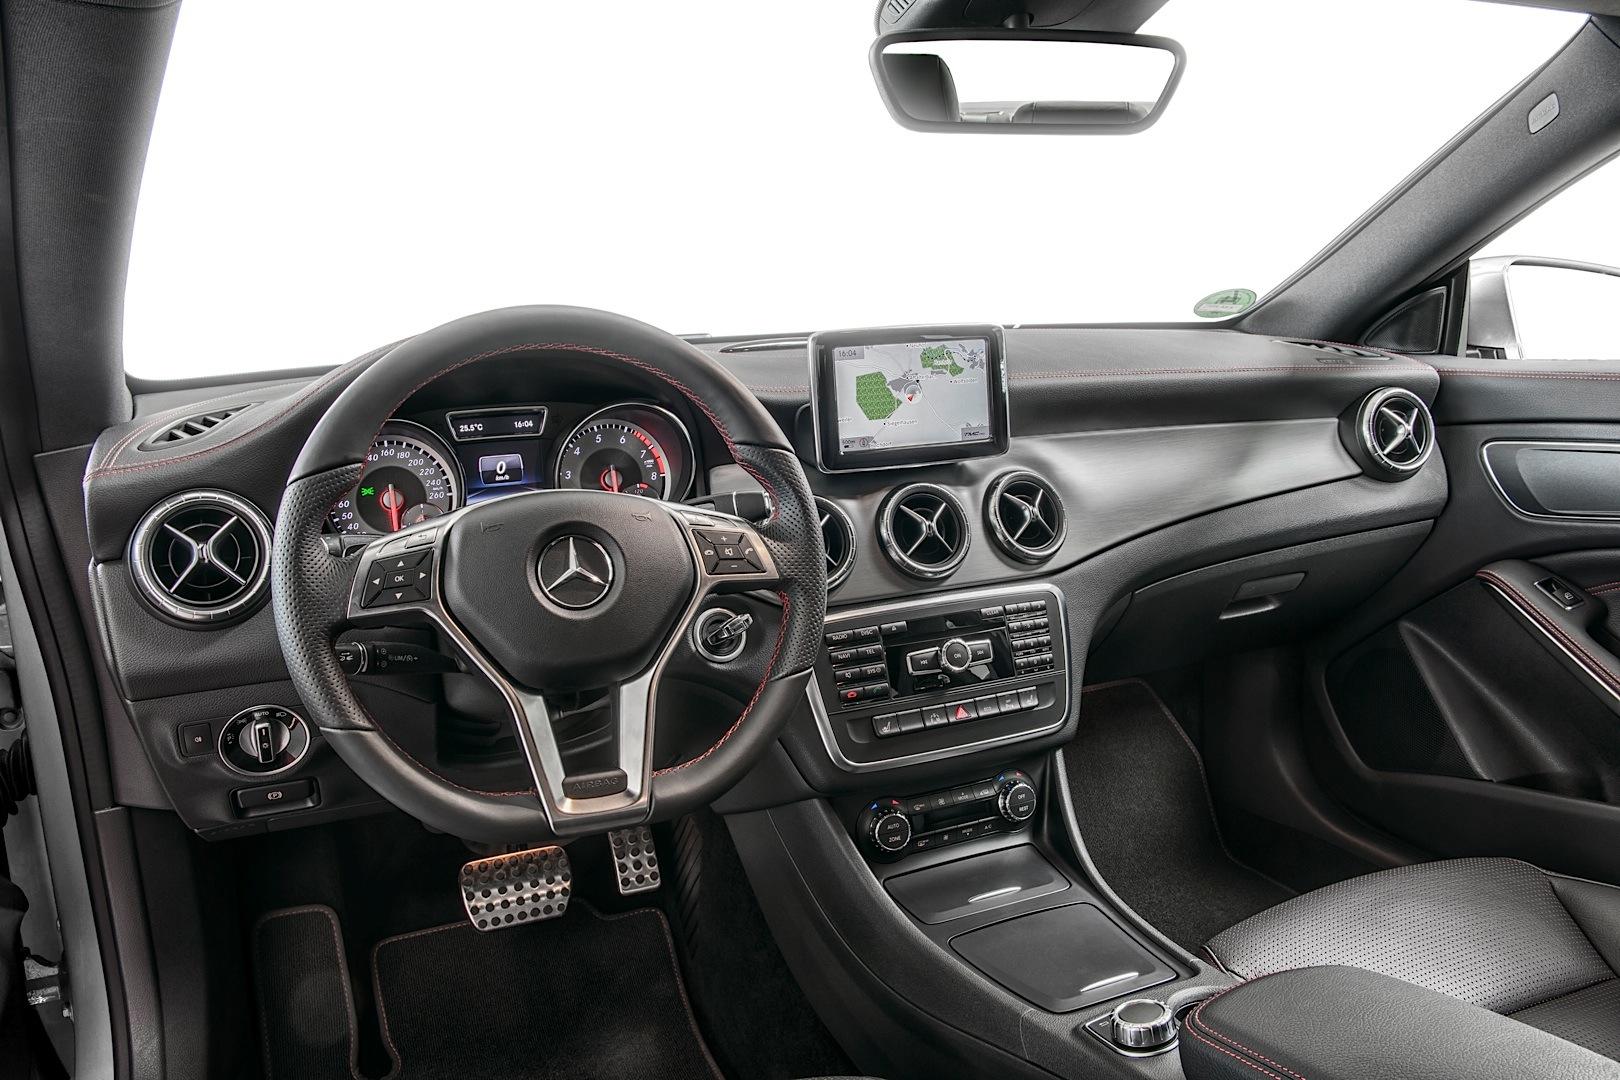 Mercedes benz mfa platform to underpin non premium models for Where do they make mercedes benz